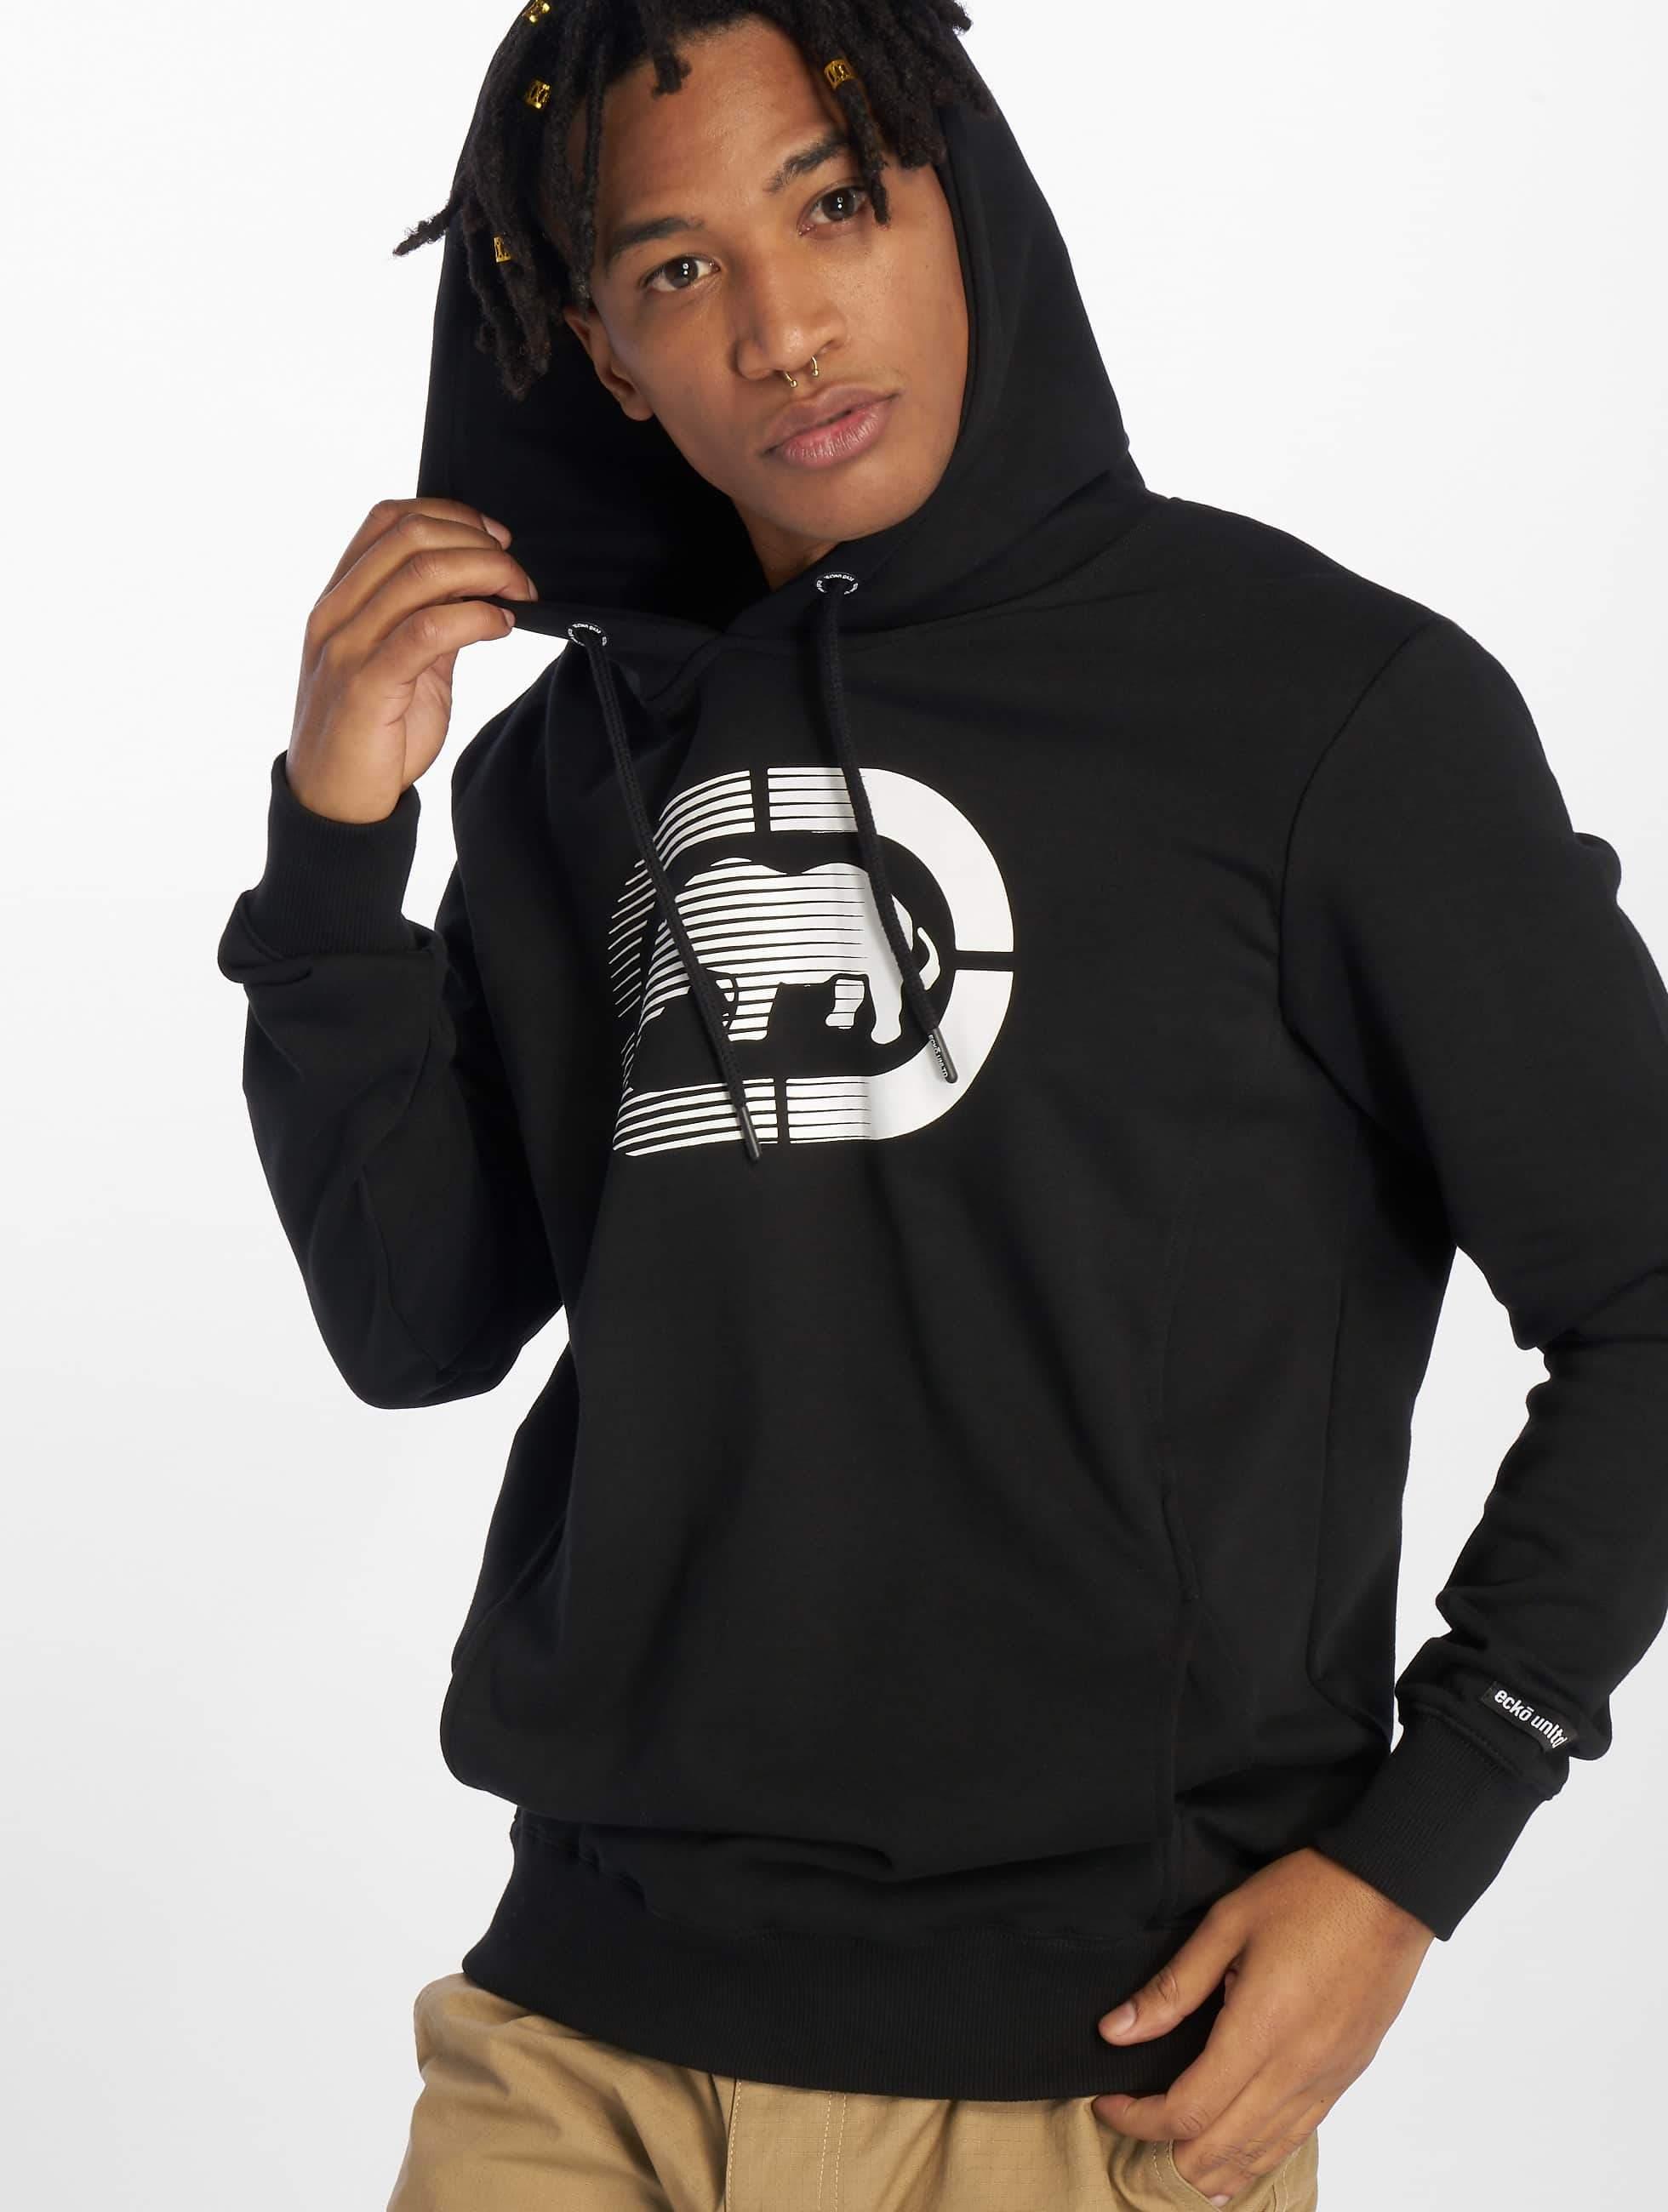 Ecko Unltd. / Hoodie 5050 in black XL